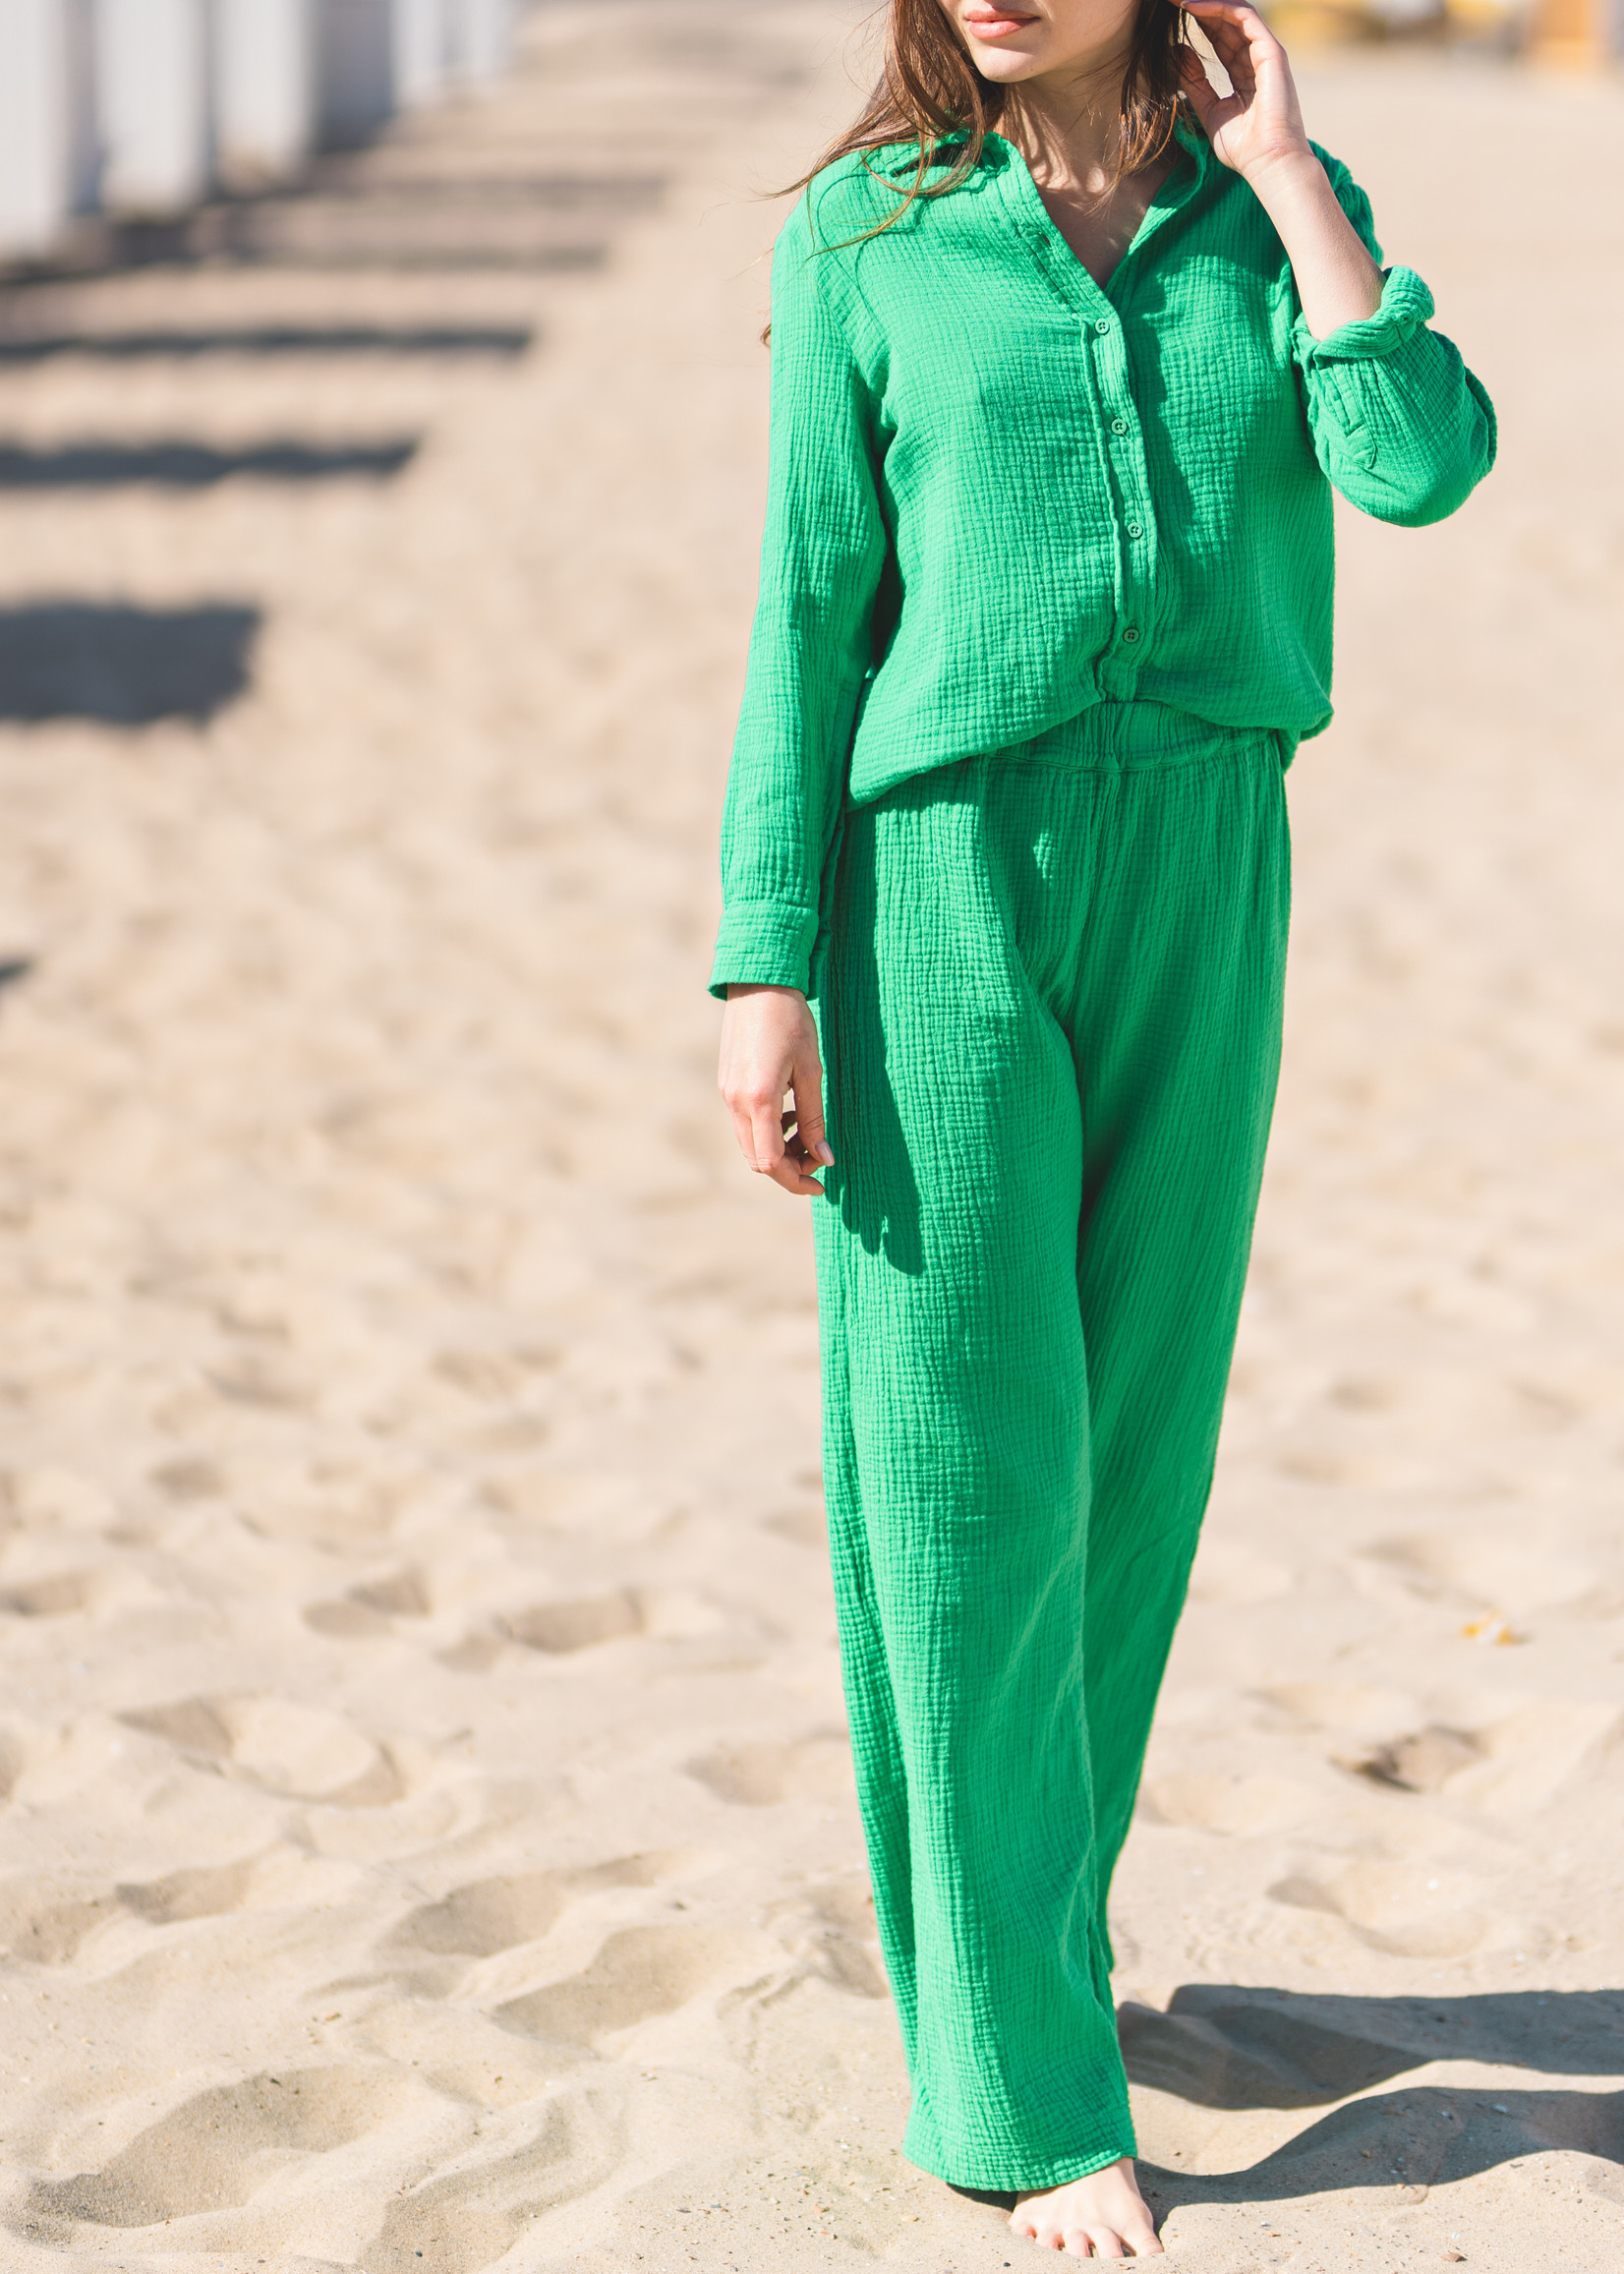 Heavenly Danni Shirt - Apple Green